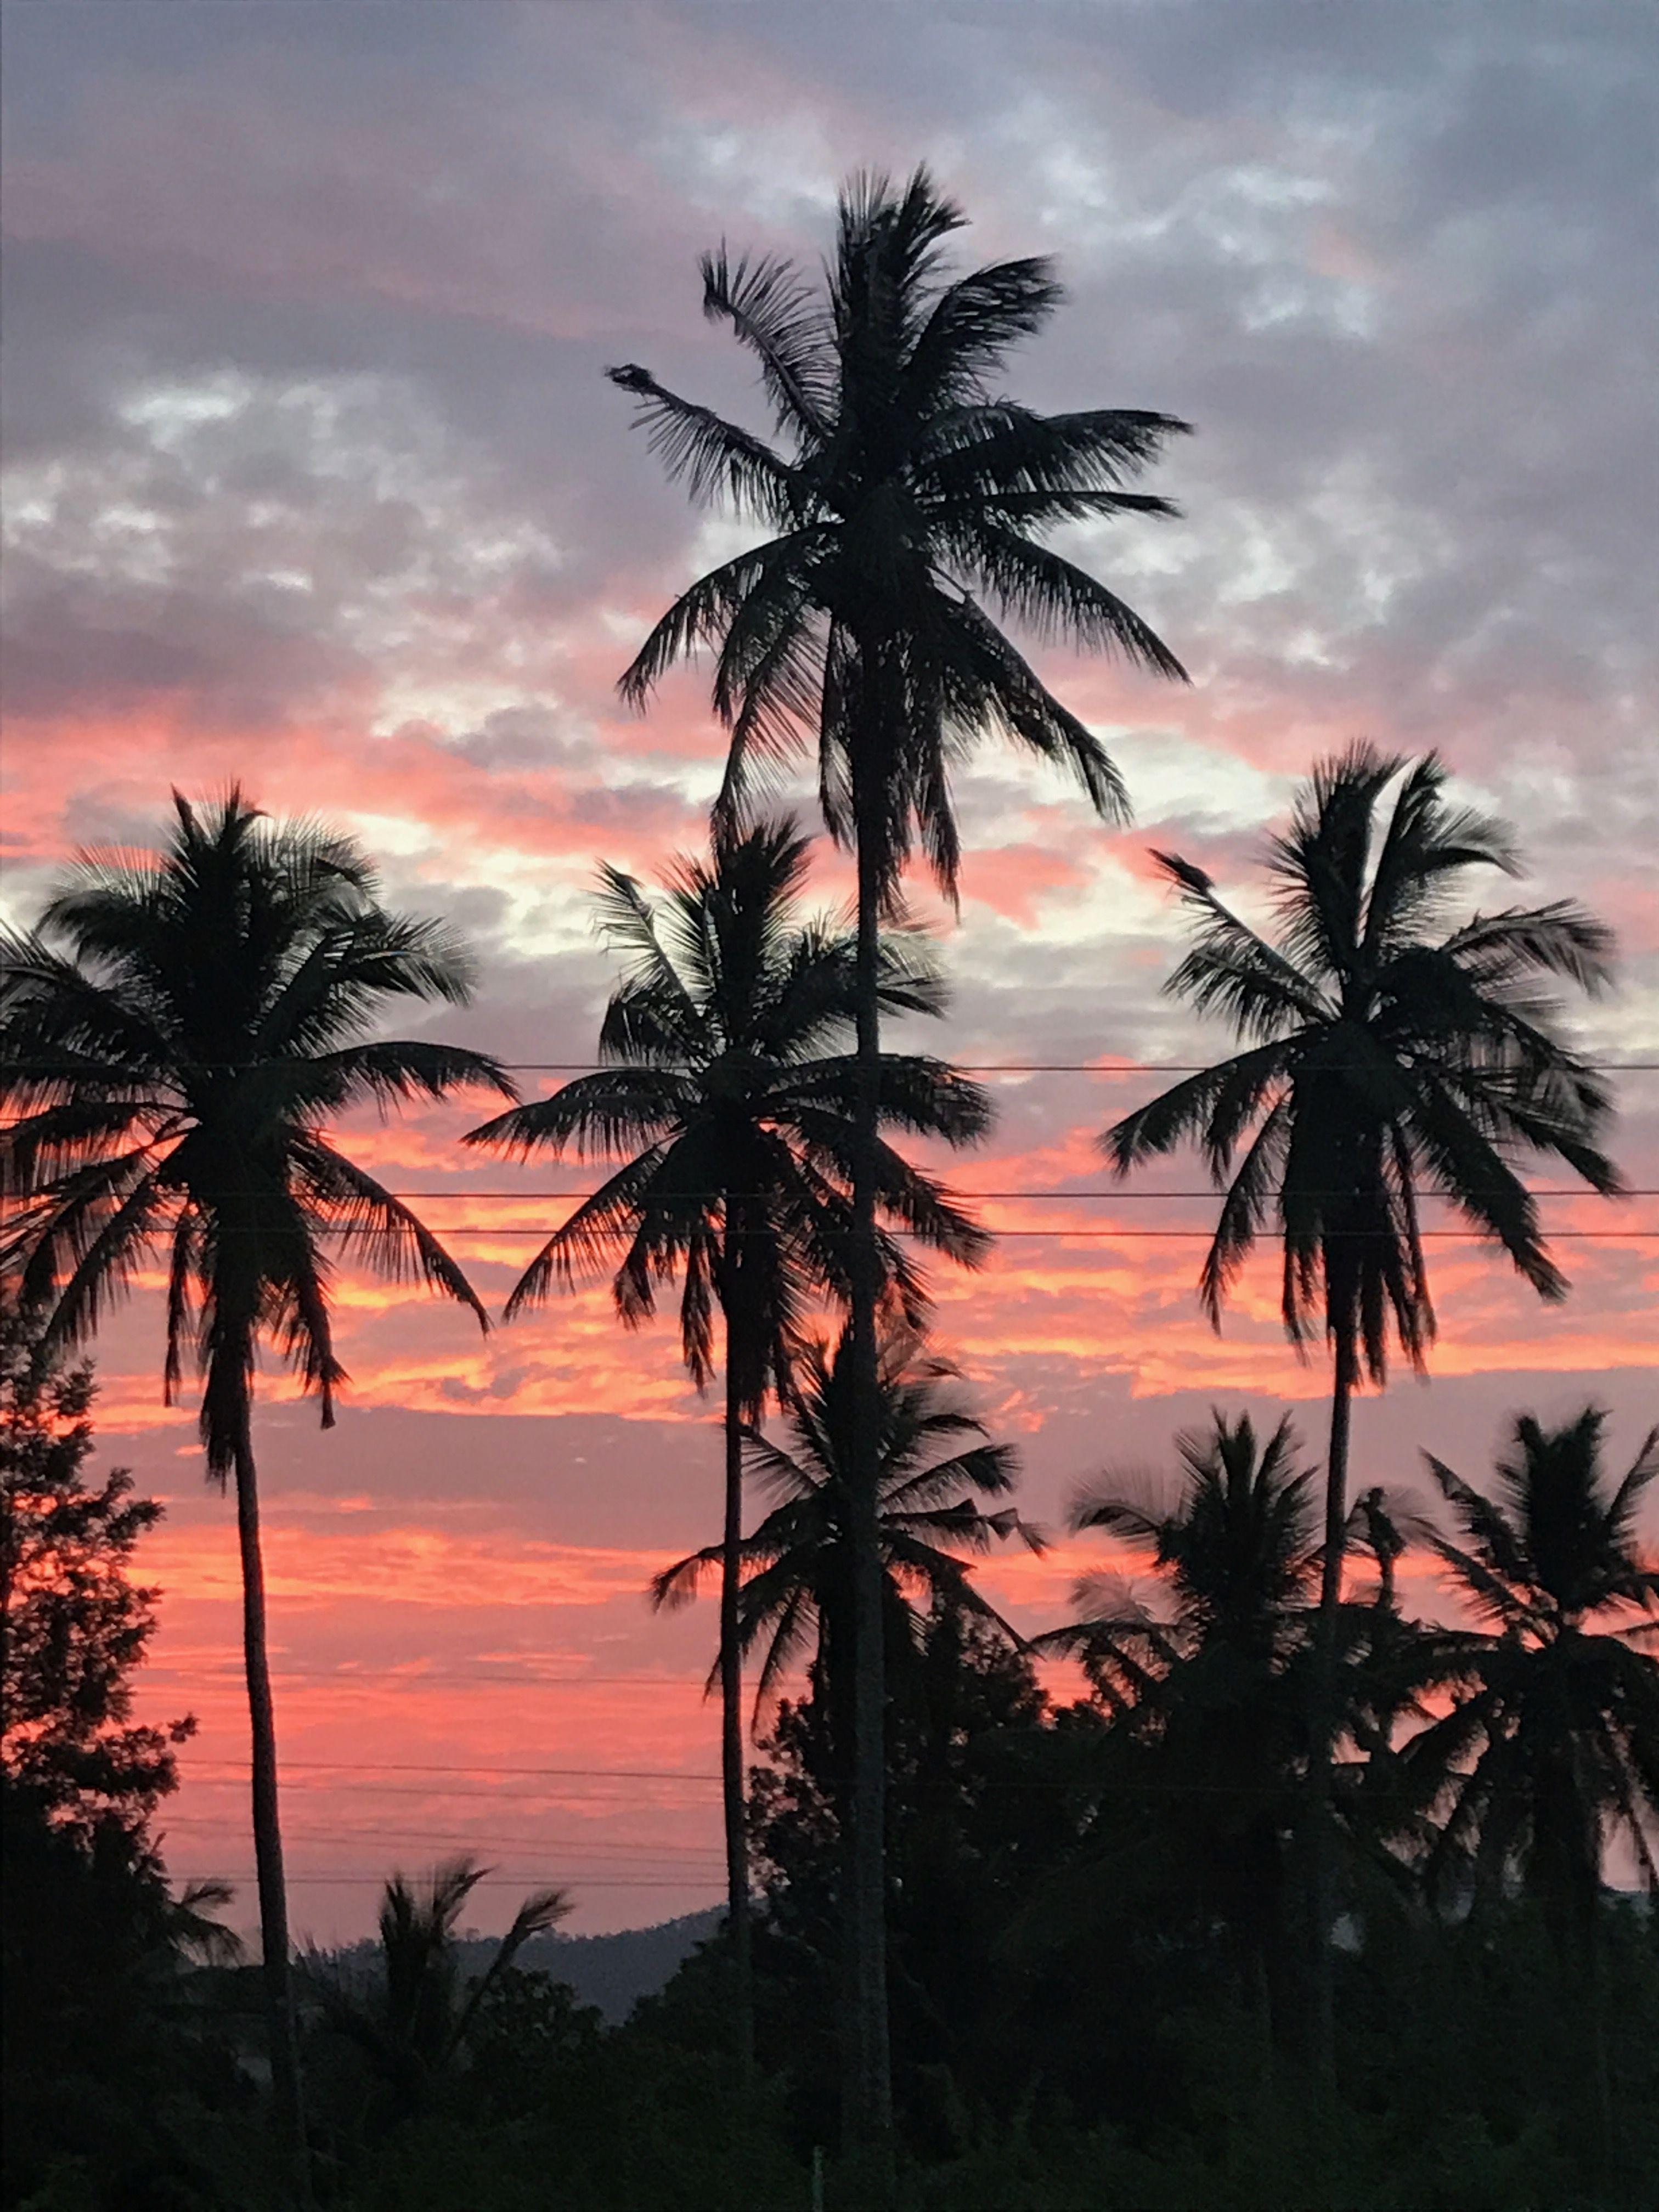 Pin By Frank Sua Rez Castelo On Sun Set Sky Aesthetic Nature Photography Palm Trees Wallpaper Palm trees sunset horizon sky clouds